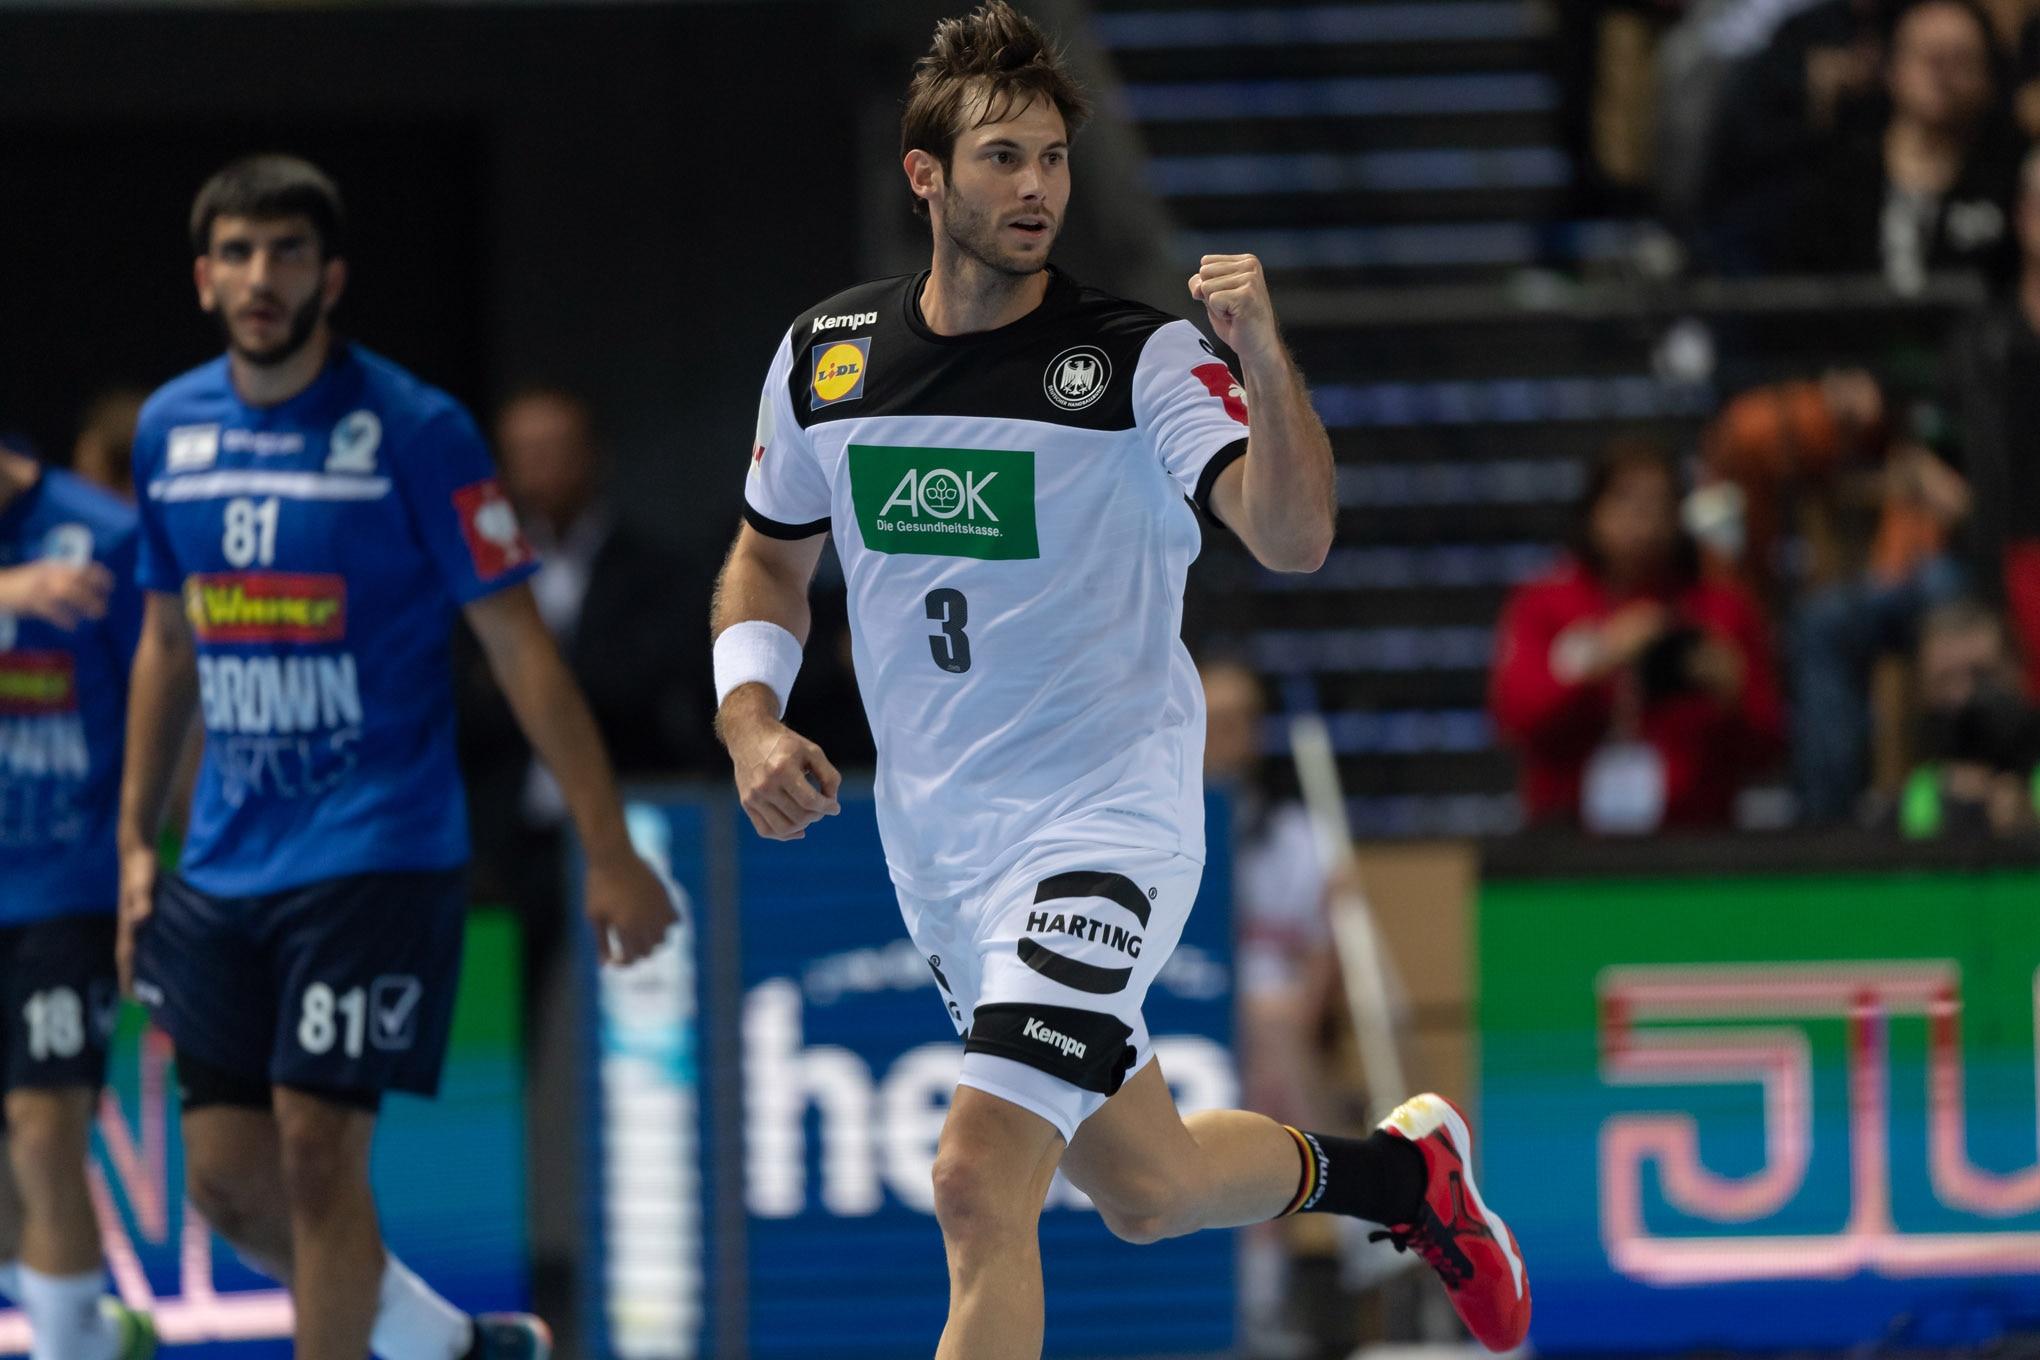 017 auto news four wheeler falken handball championship